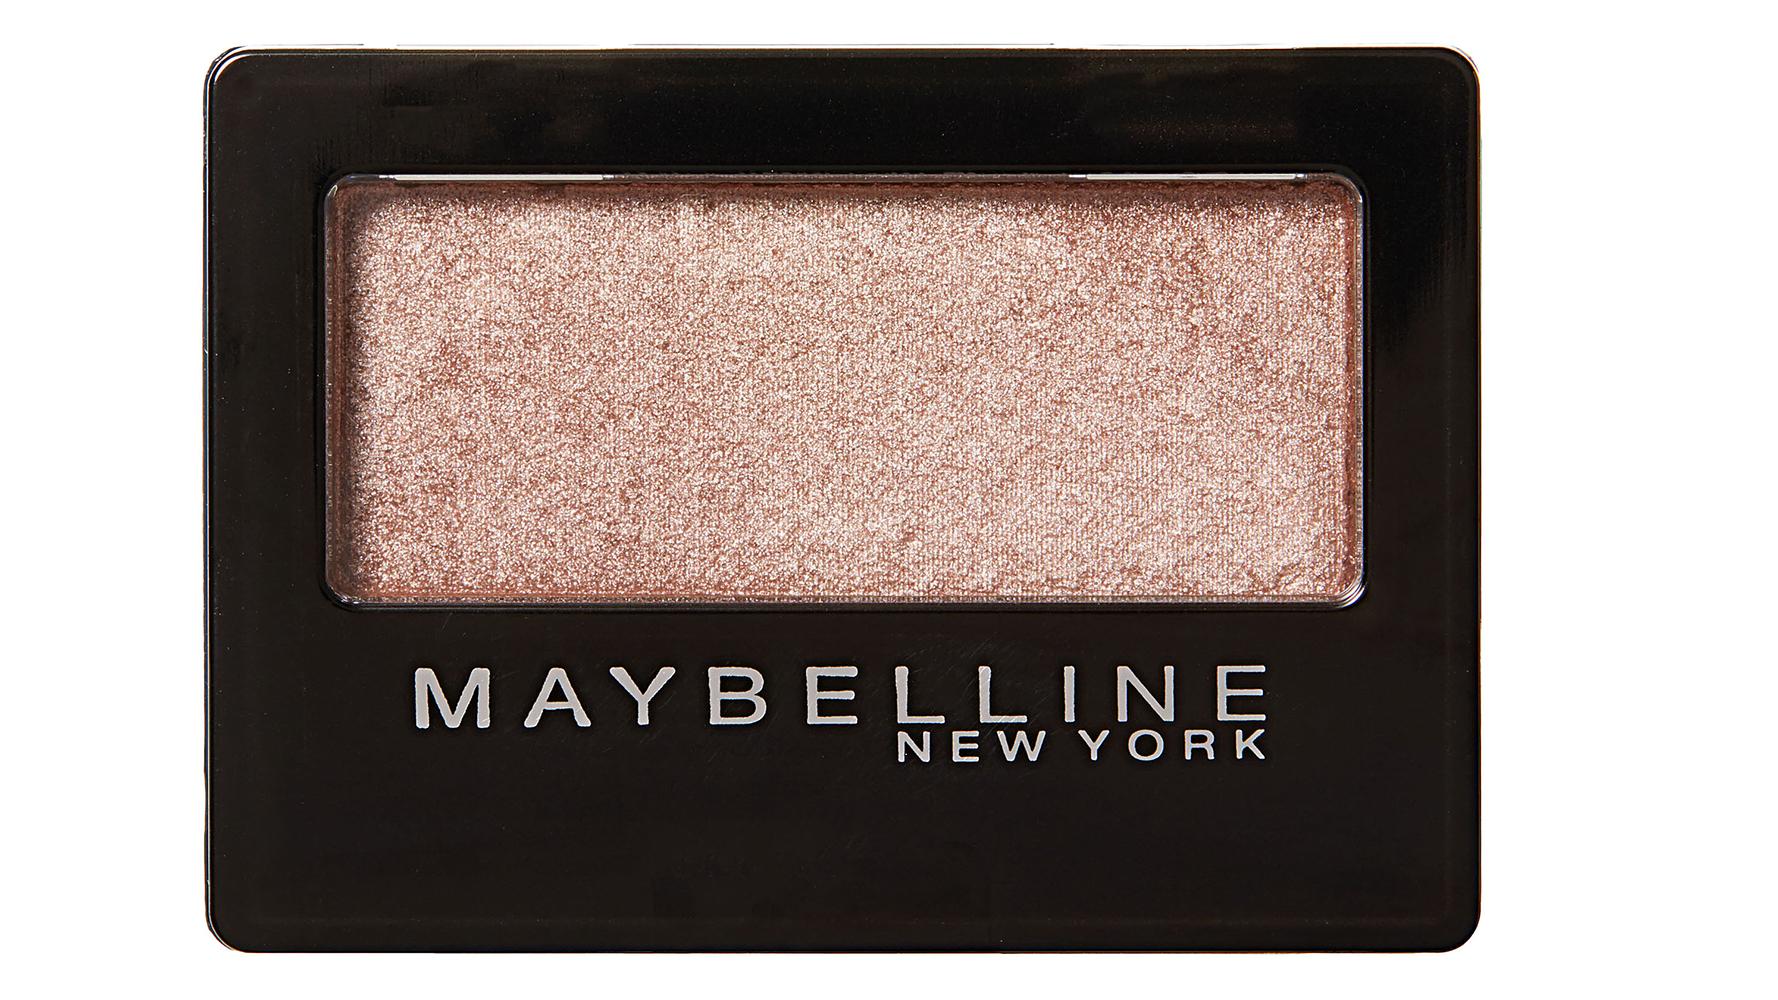 Maybelline New York Expert Wear Eyeshadow in Nude Glow